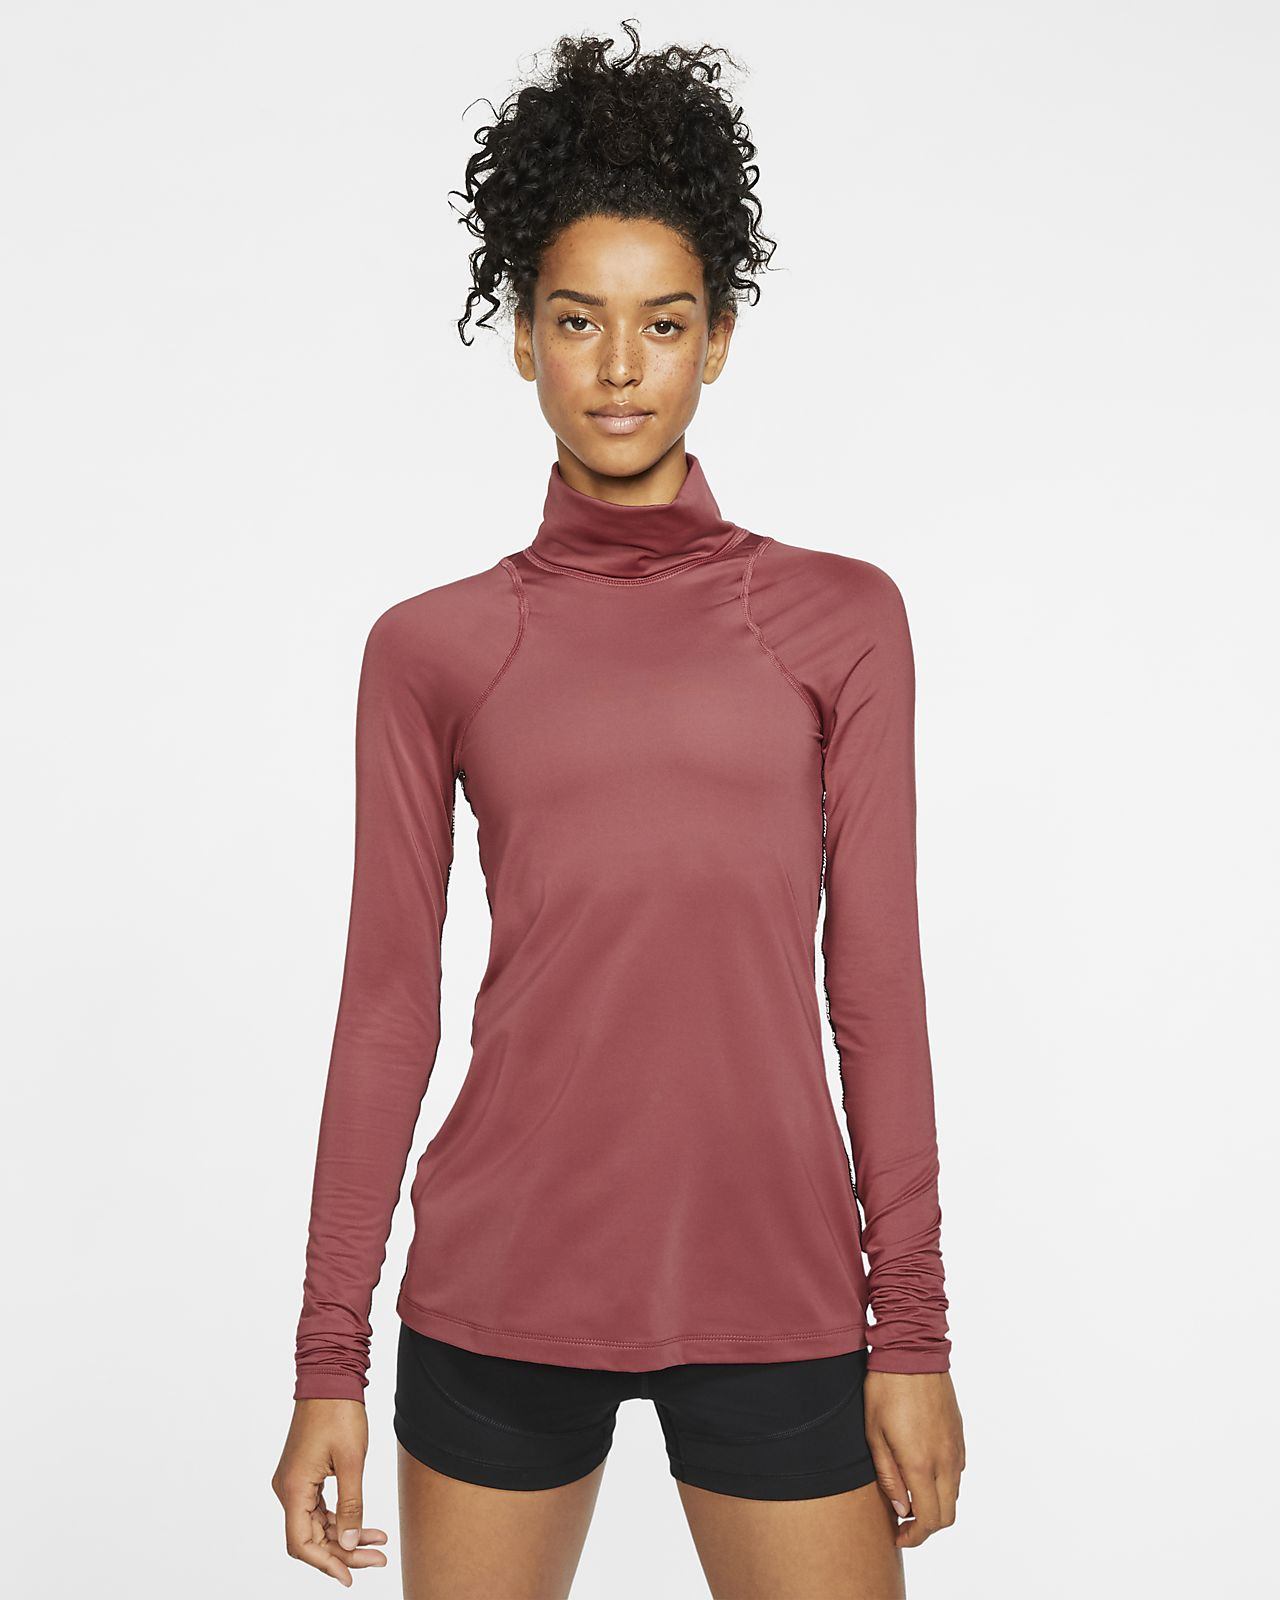 Nike Pro Warm Women's Long-Sleeve Metallic Top